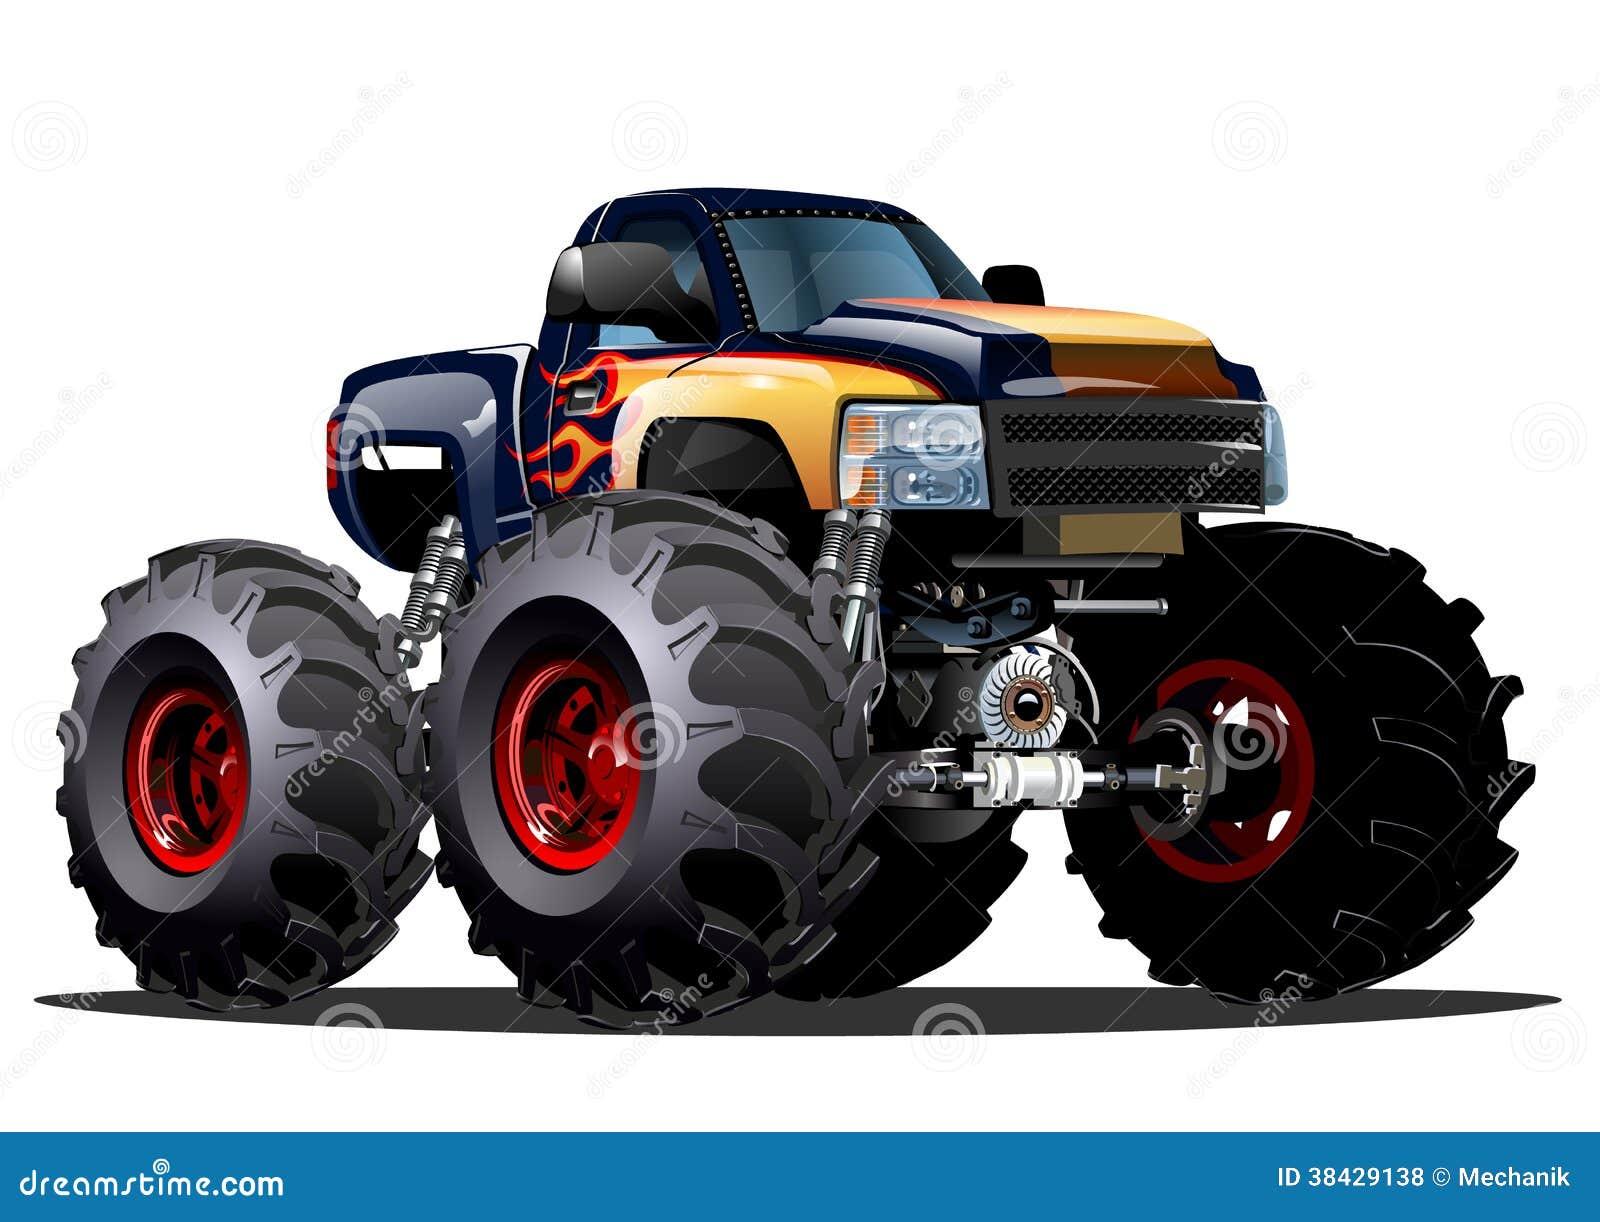 cartoon monster truck royalty free stock photos image 38429138